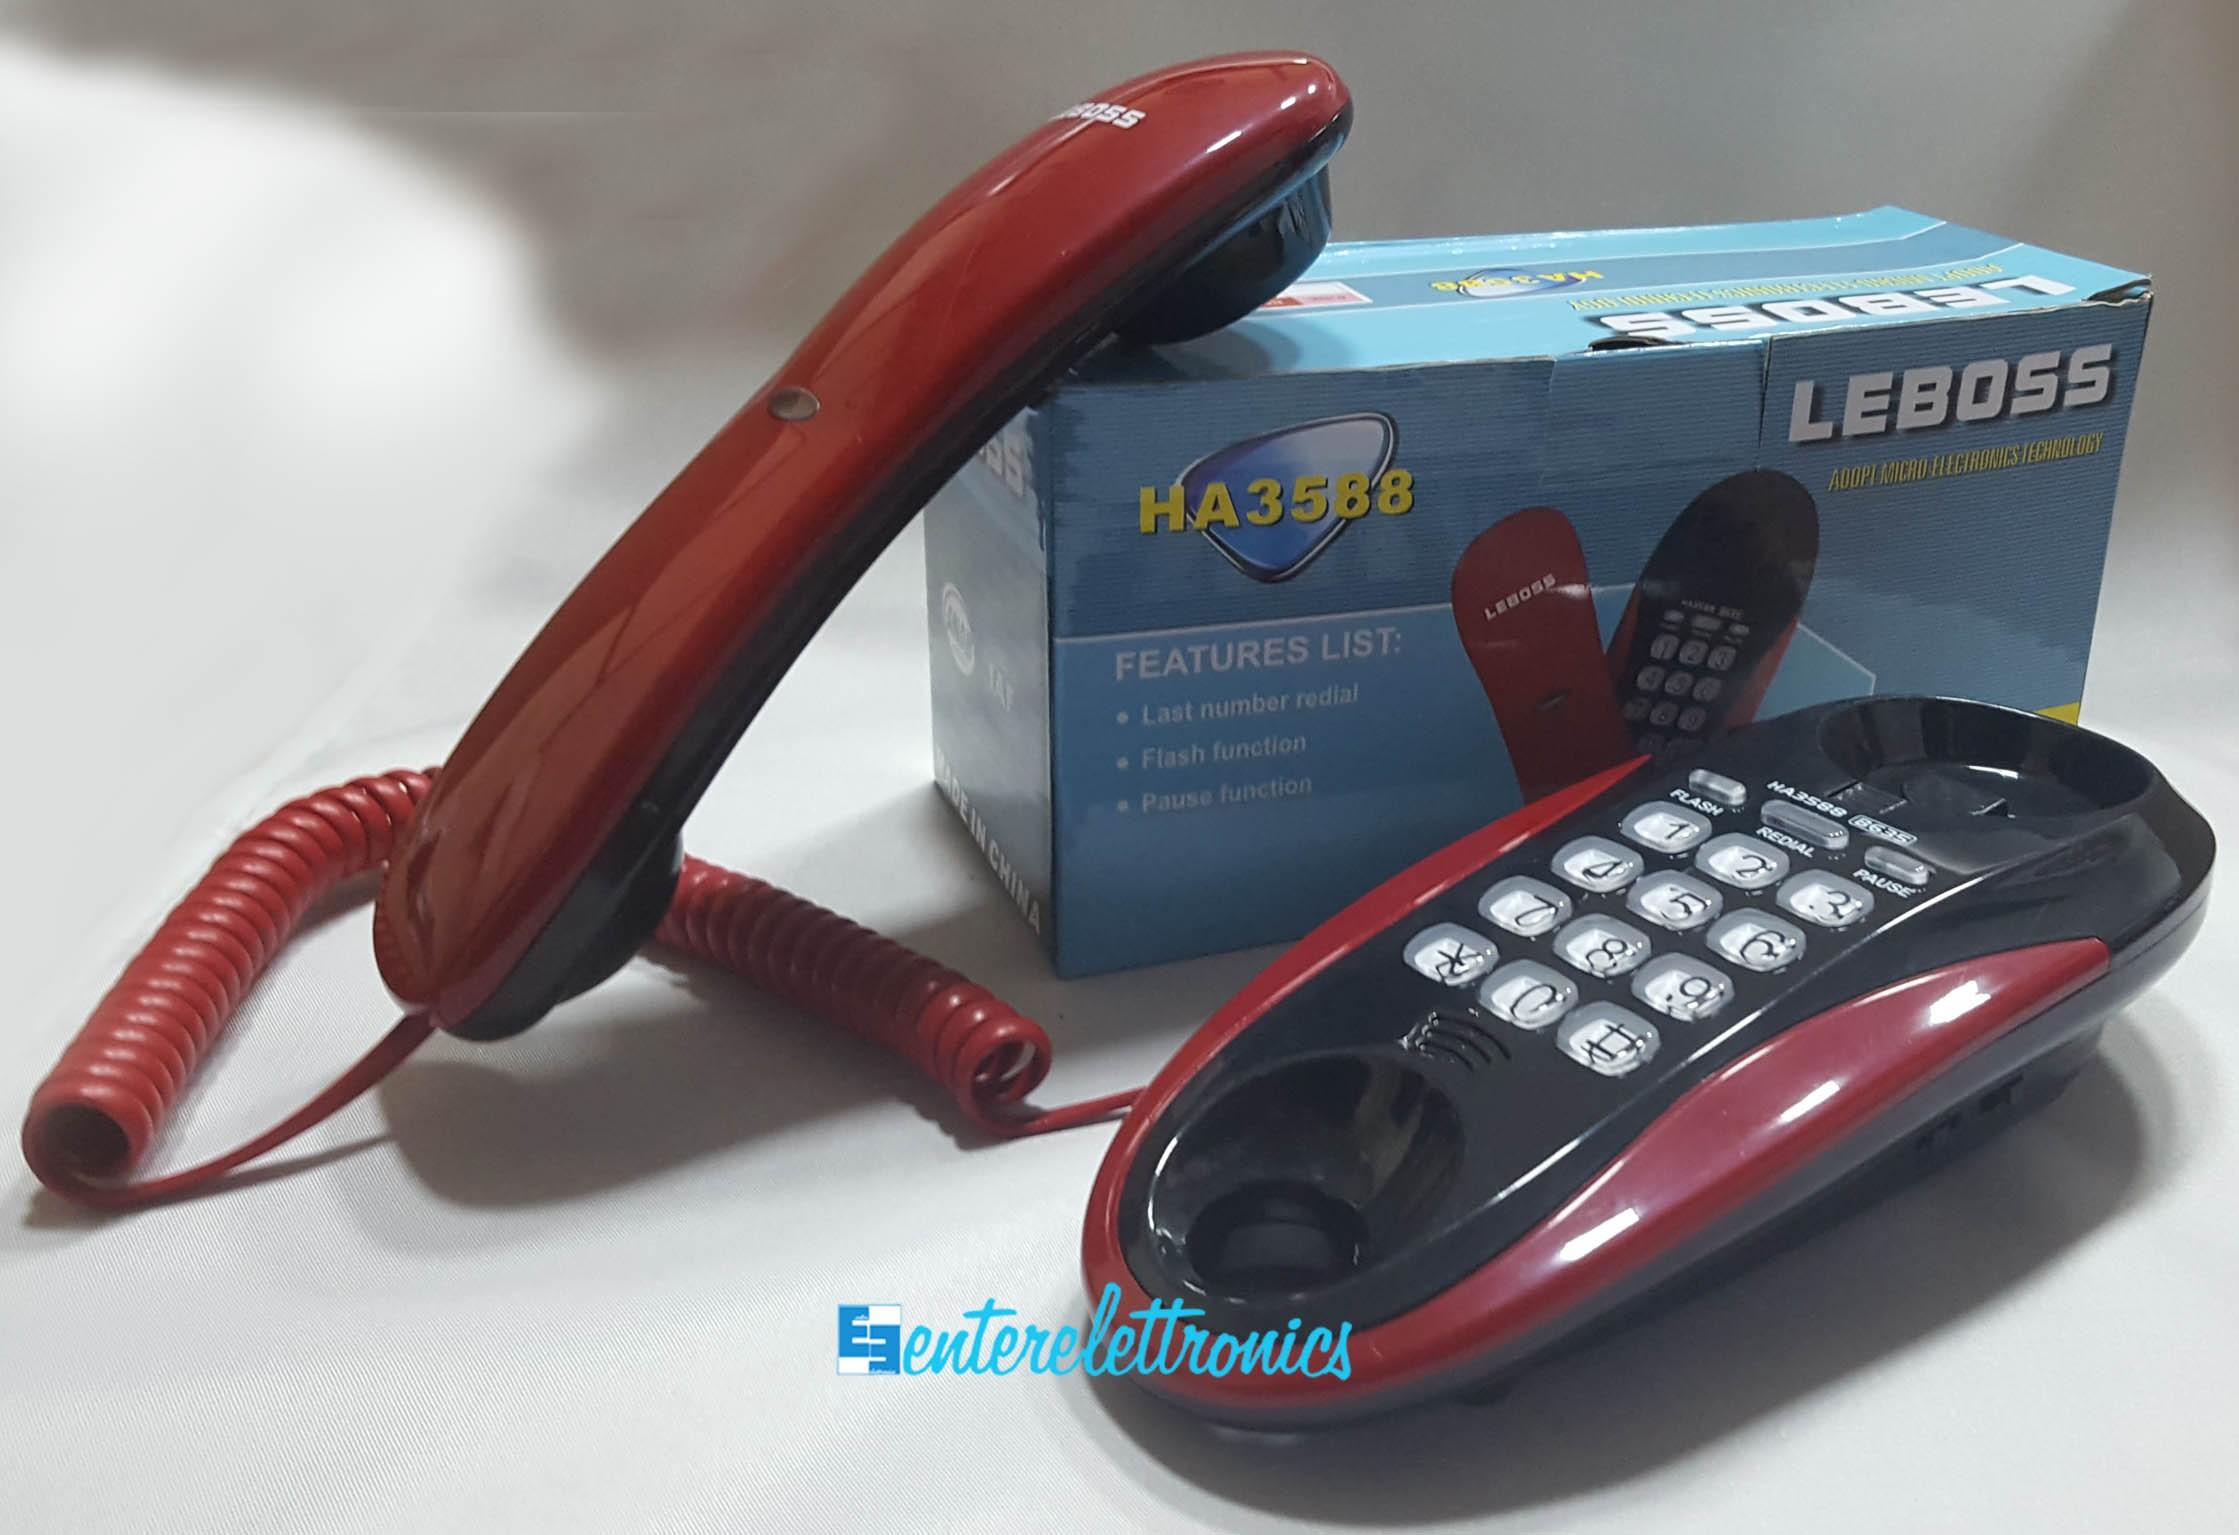 Leboss telefono fisso moderno caller phone ha3588 ebay - Telefono fisso design ...